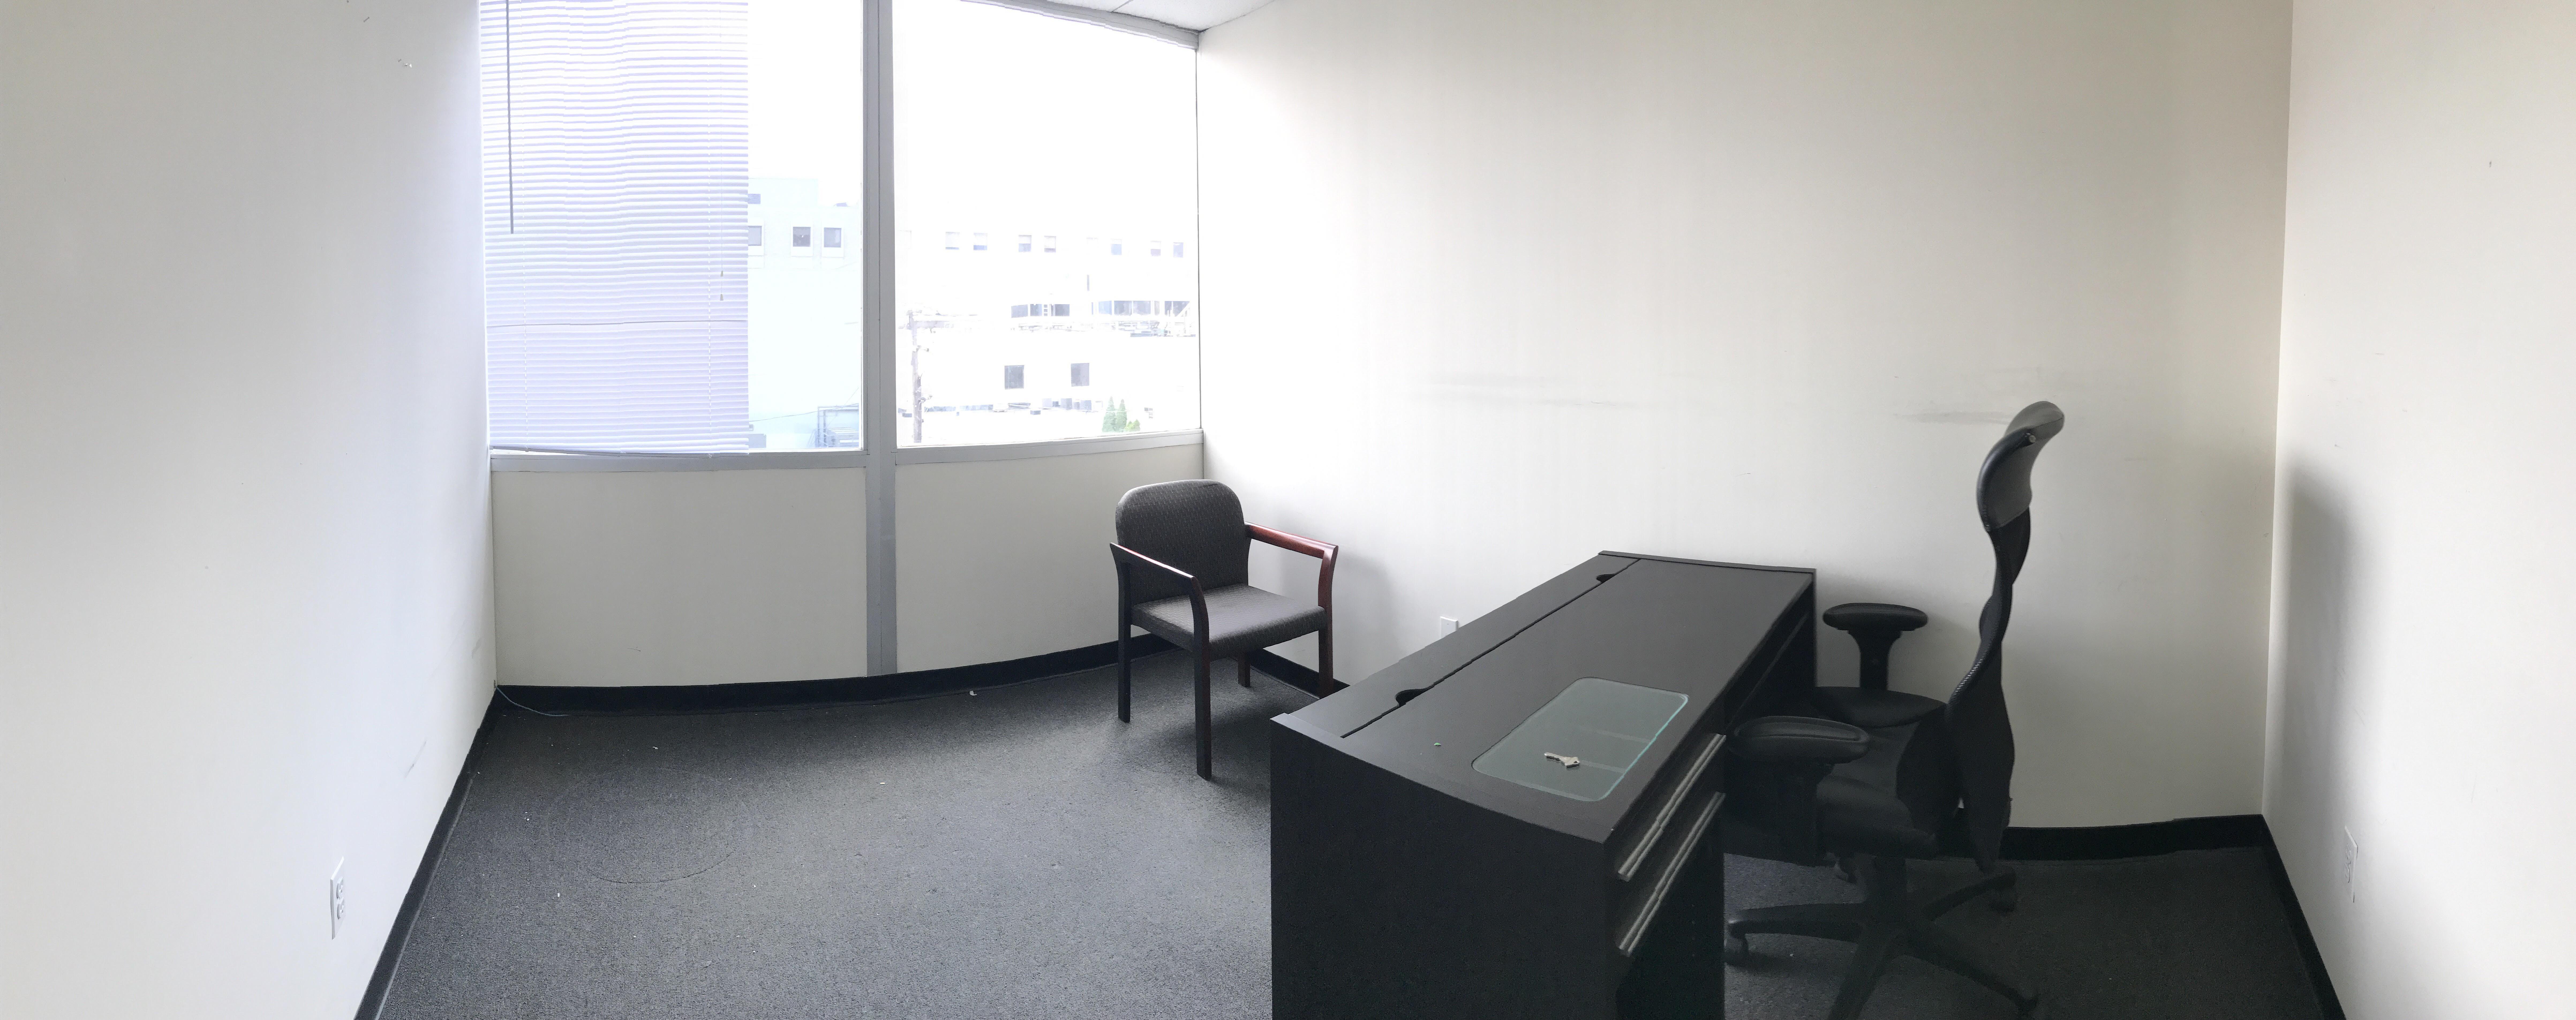 North Bergen Office Space